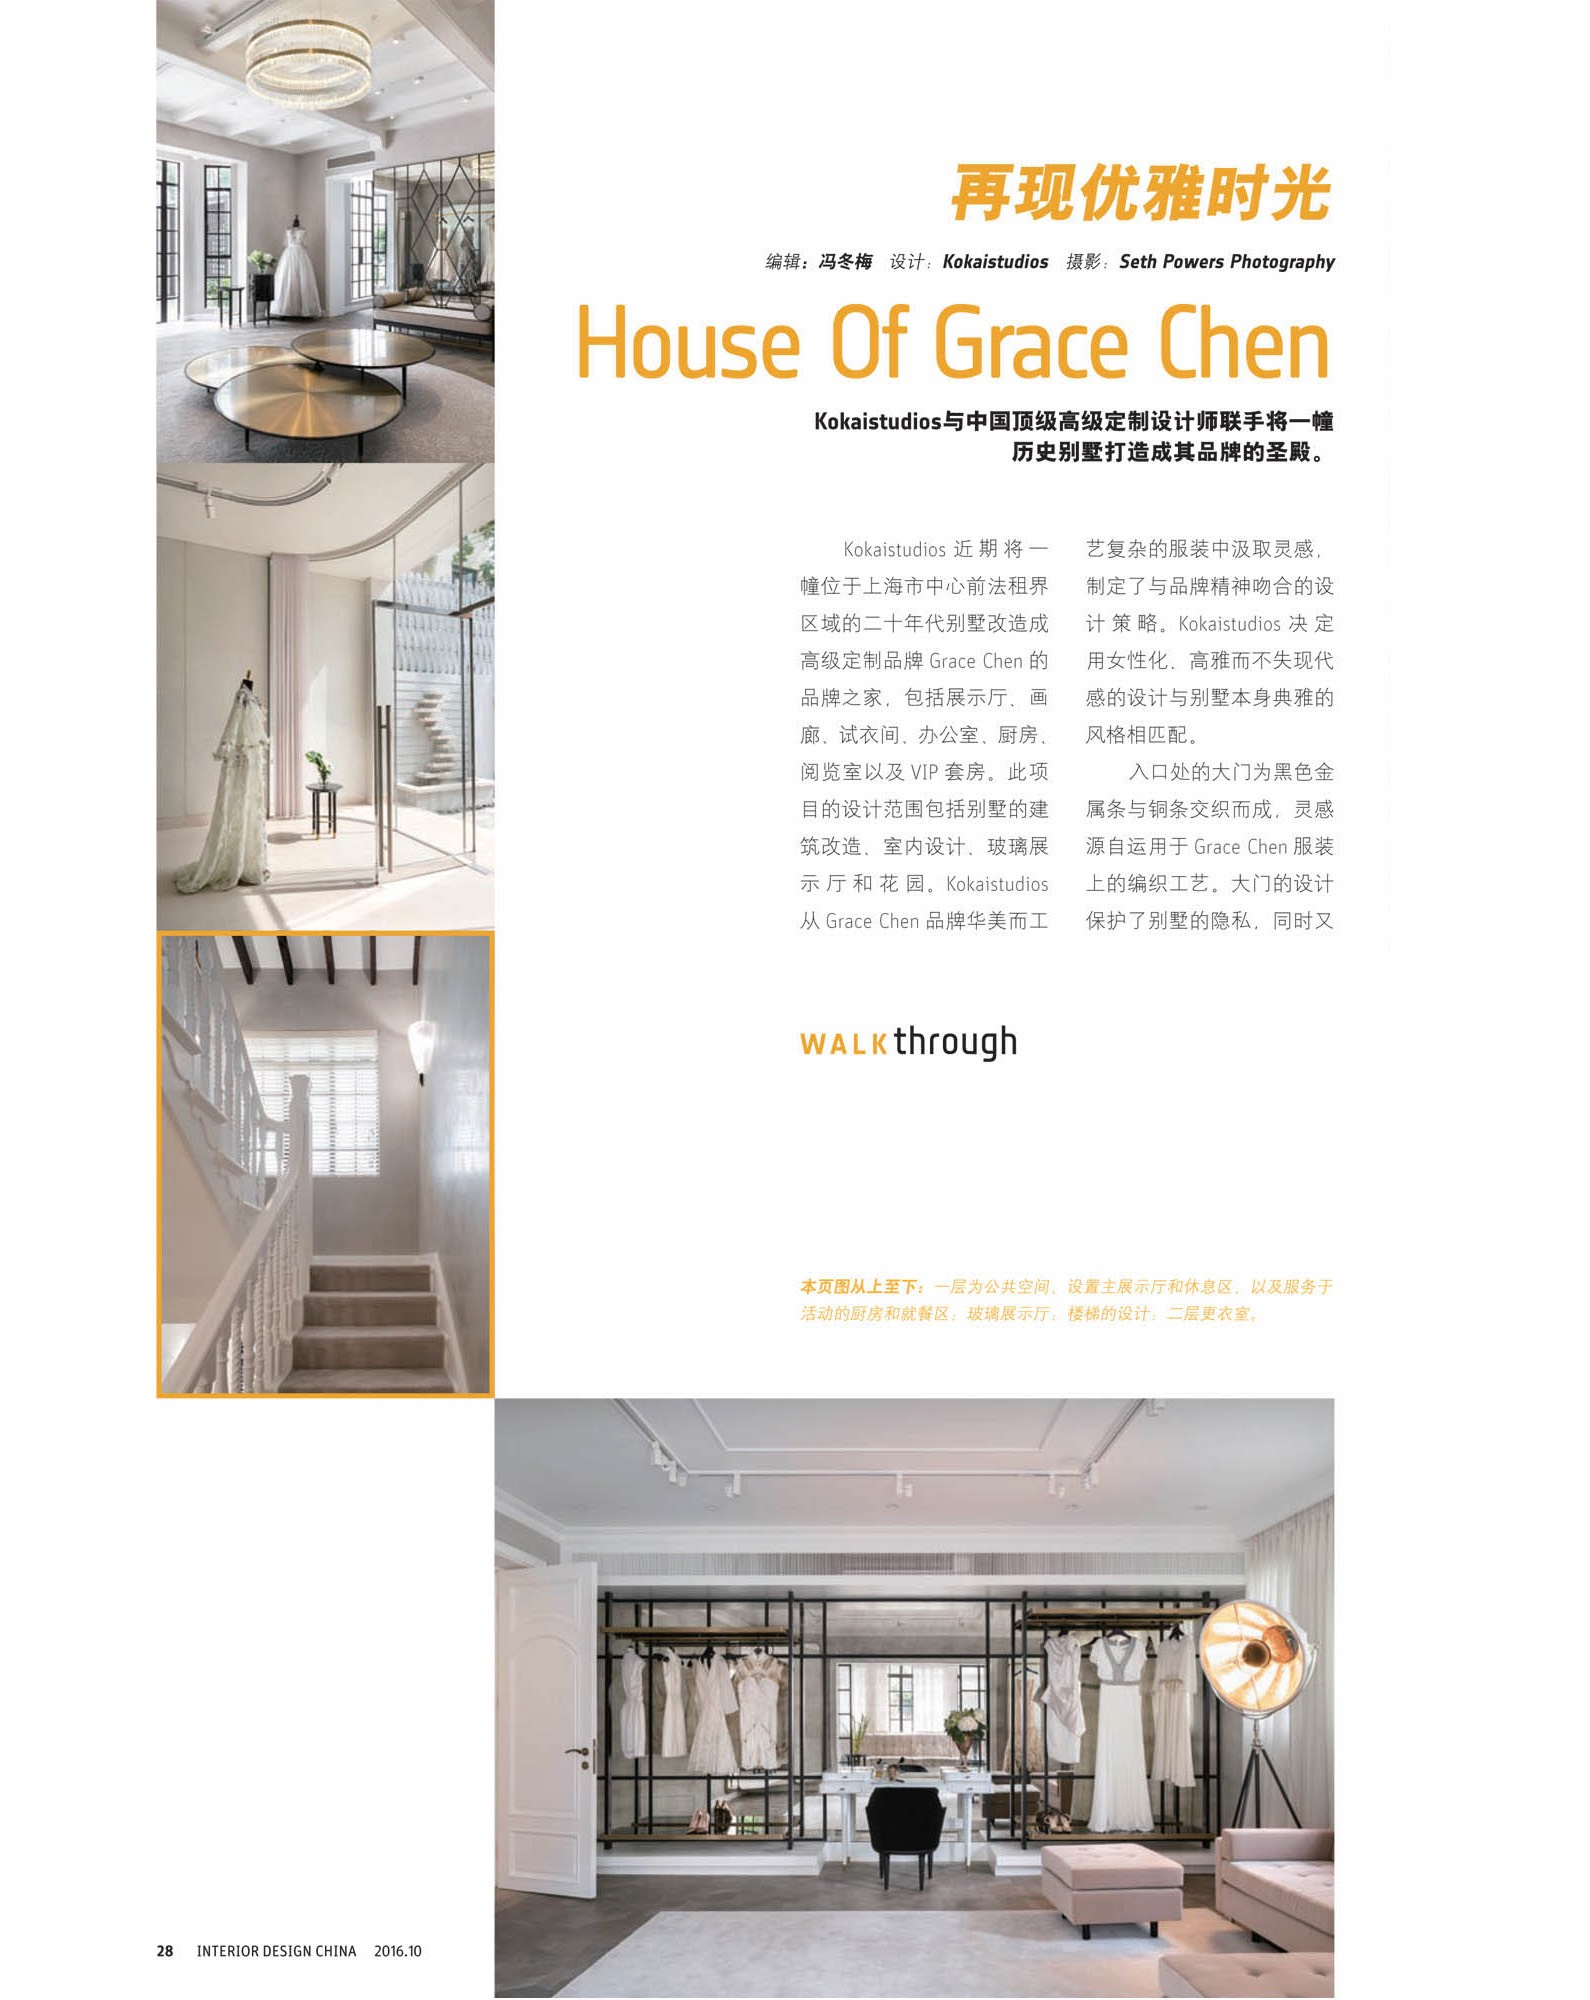 Interior Design China_201610_Grace Chen_2.jpg